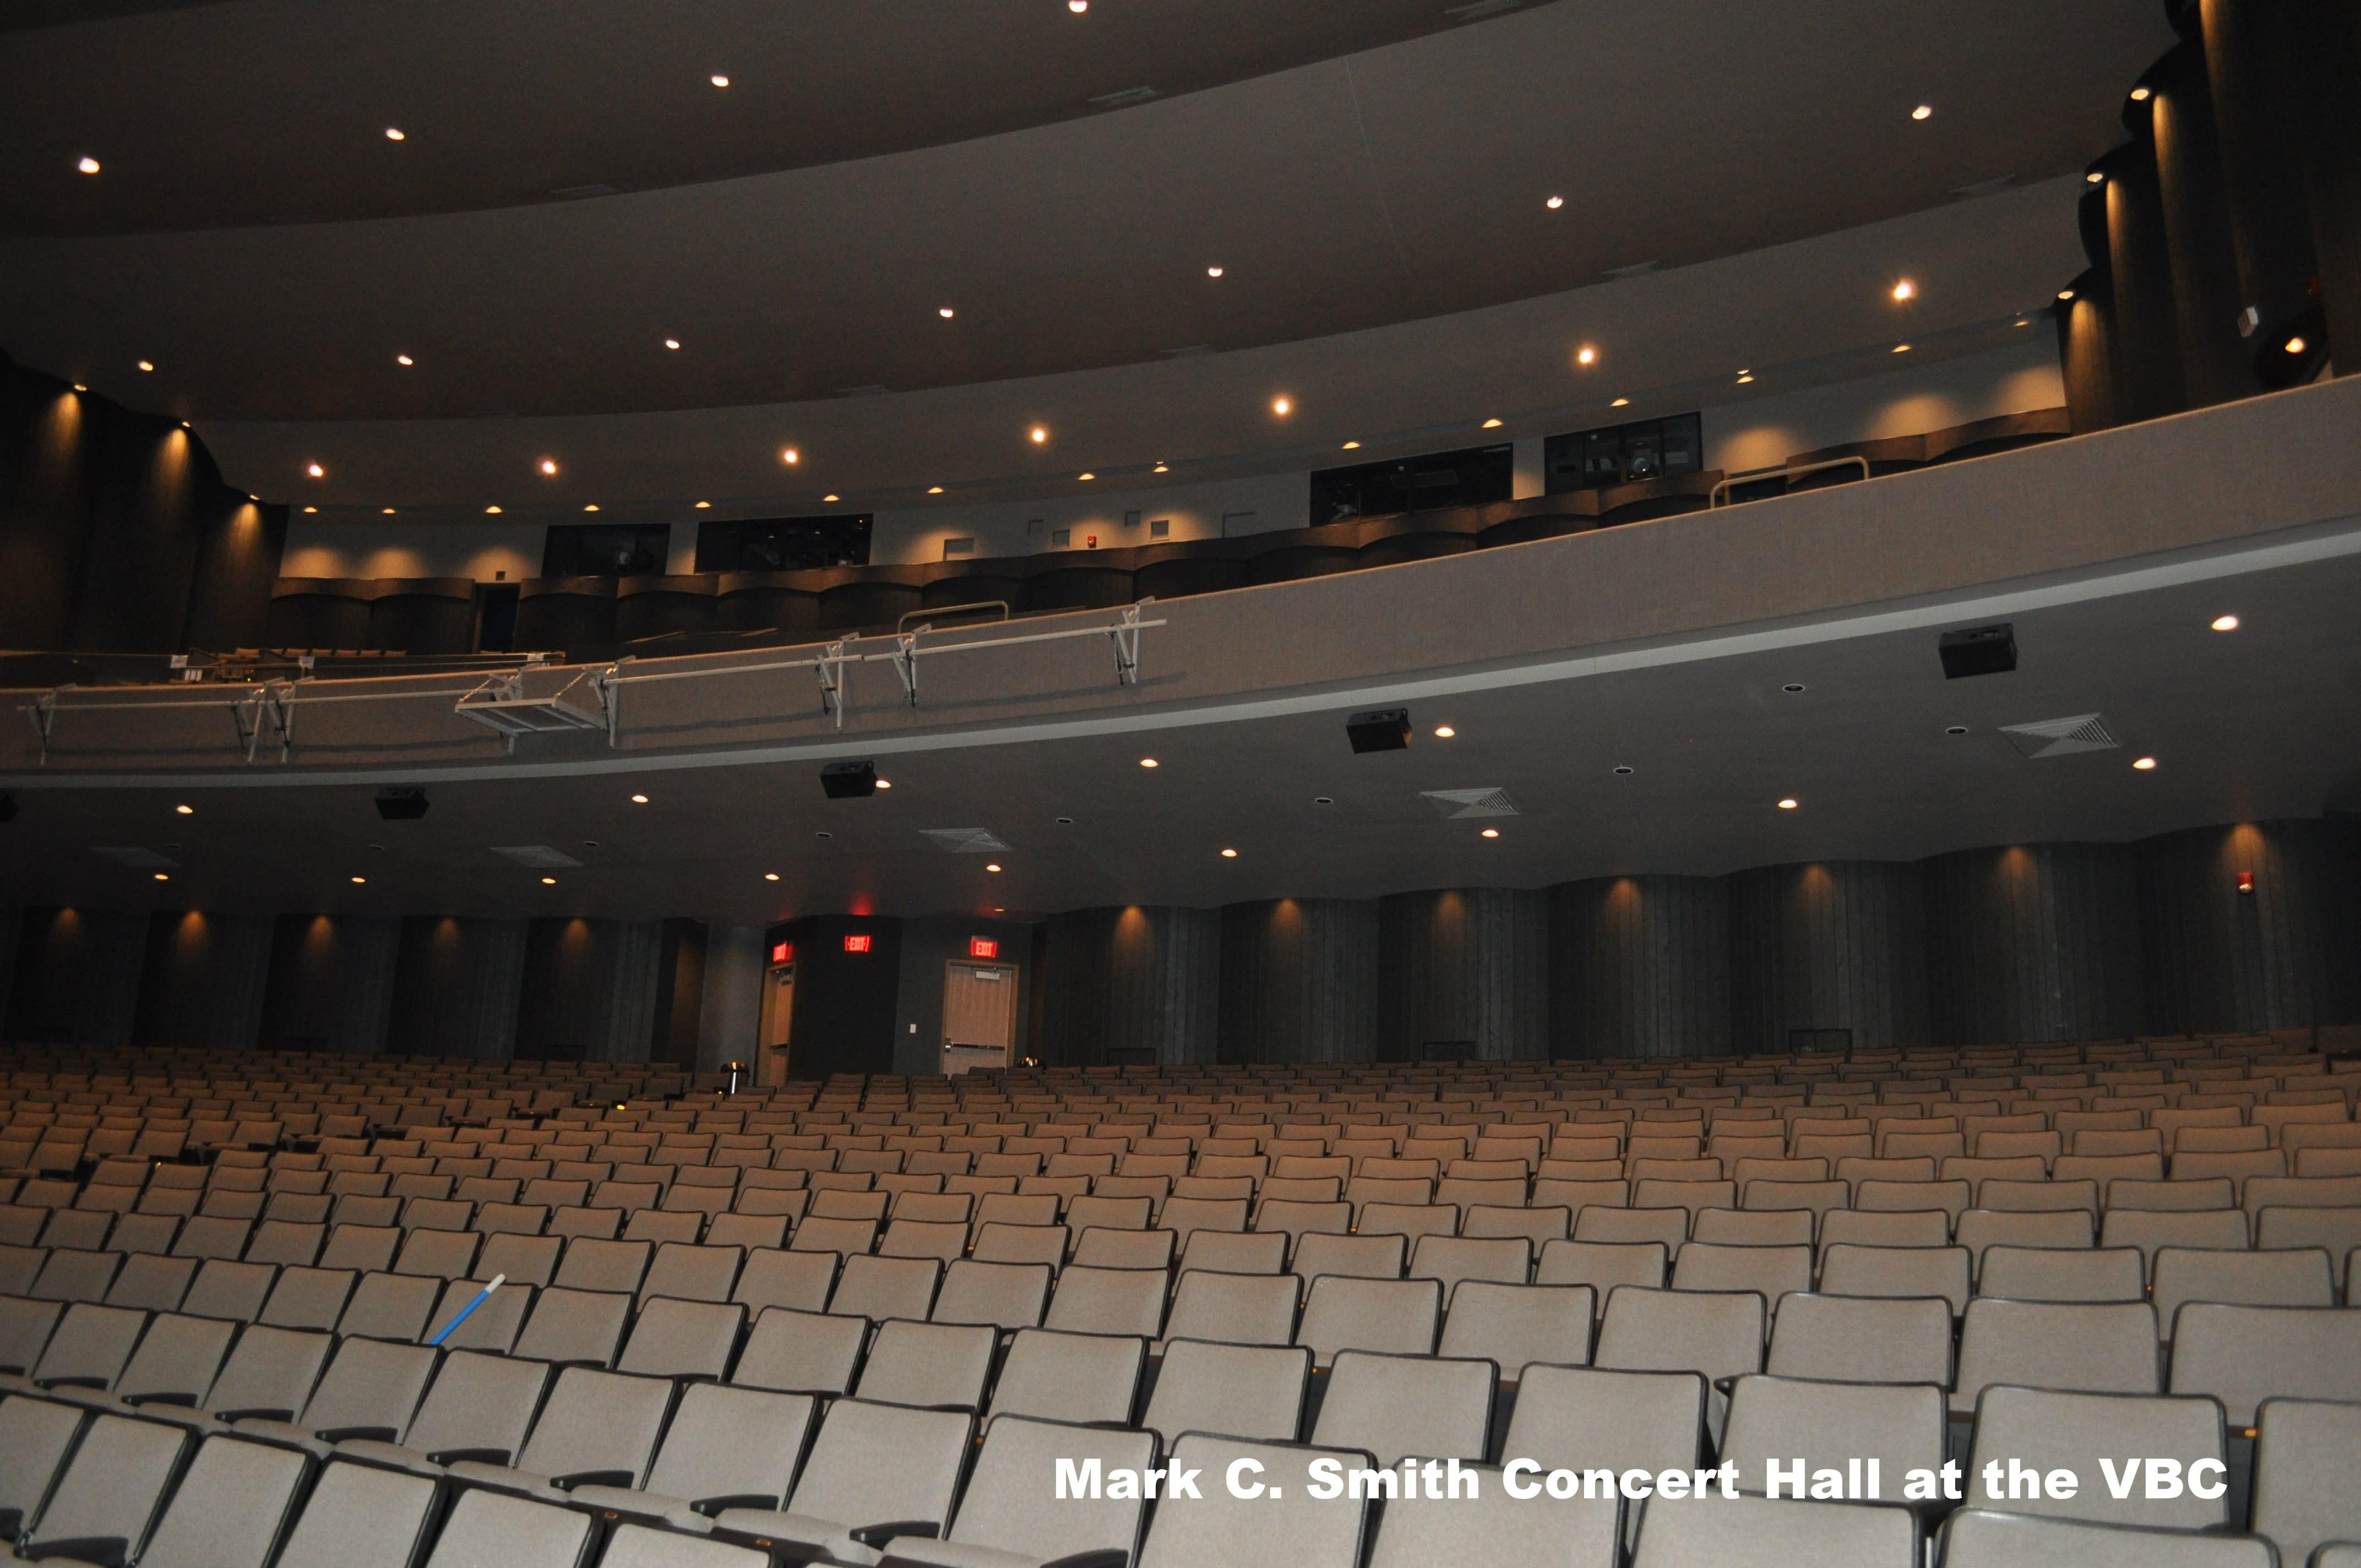 Mark C. Smith Concert Hall at the VBC